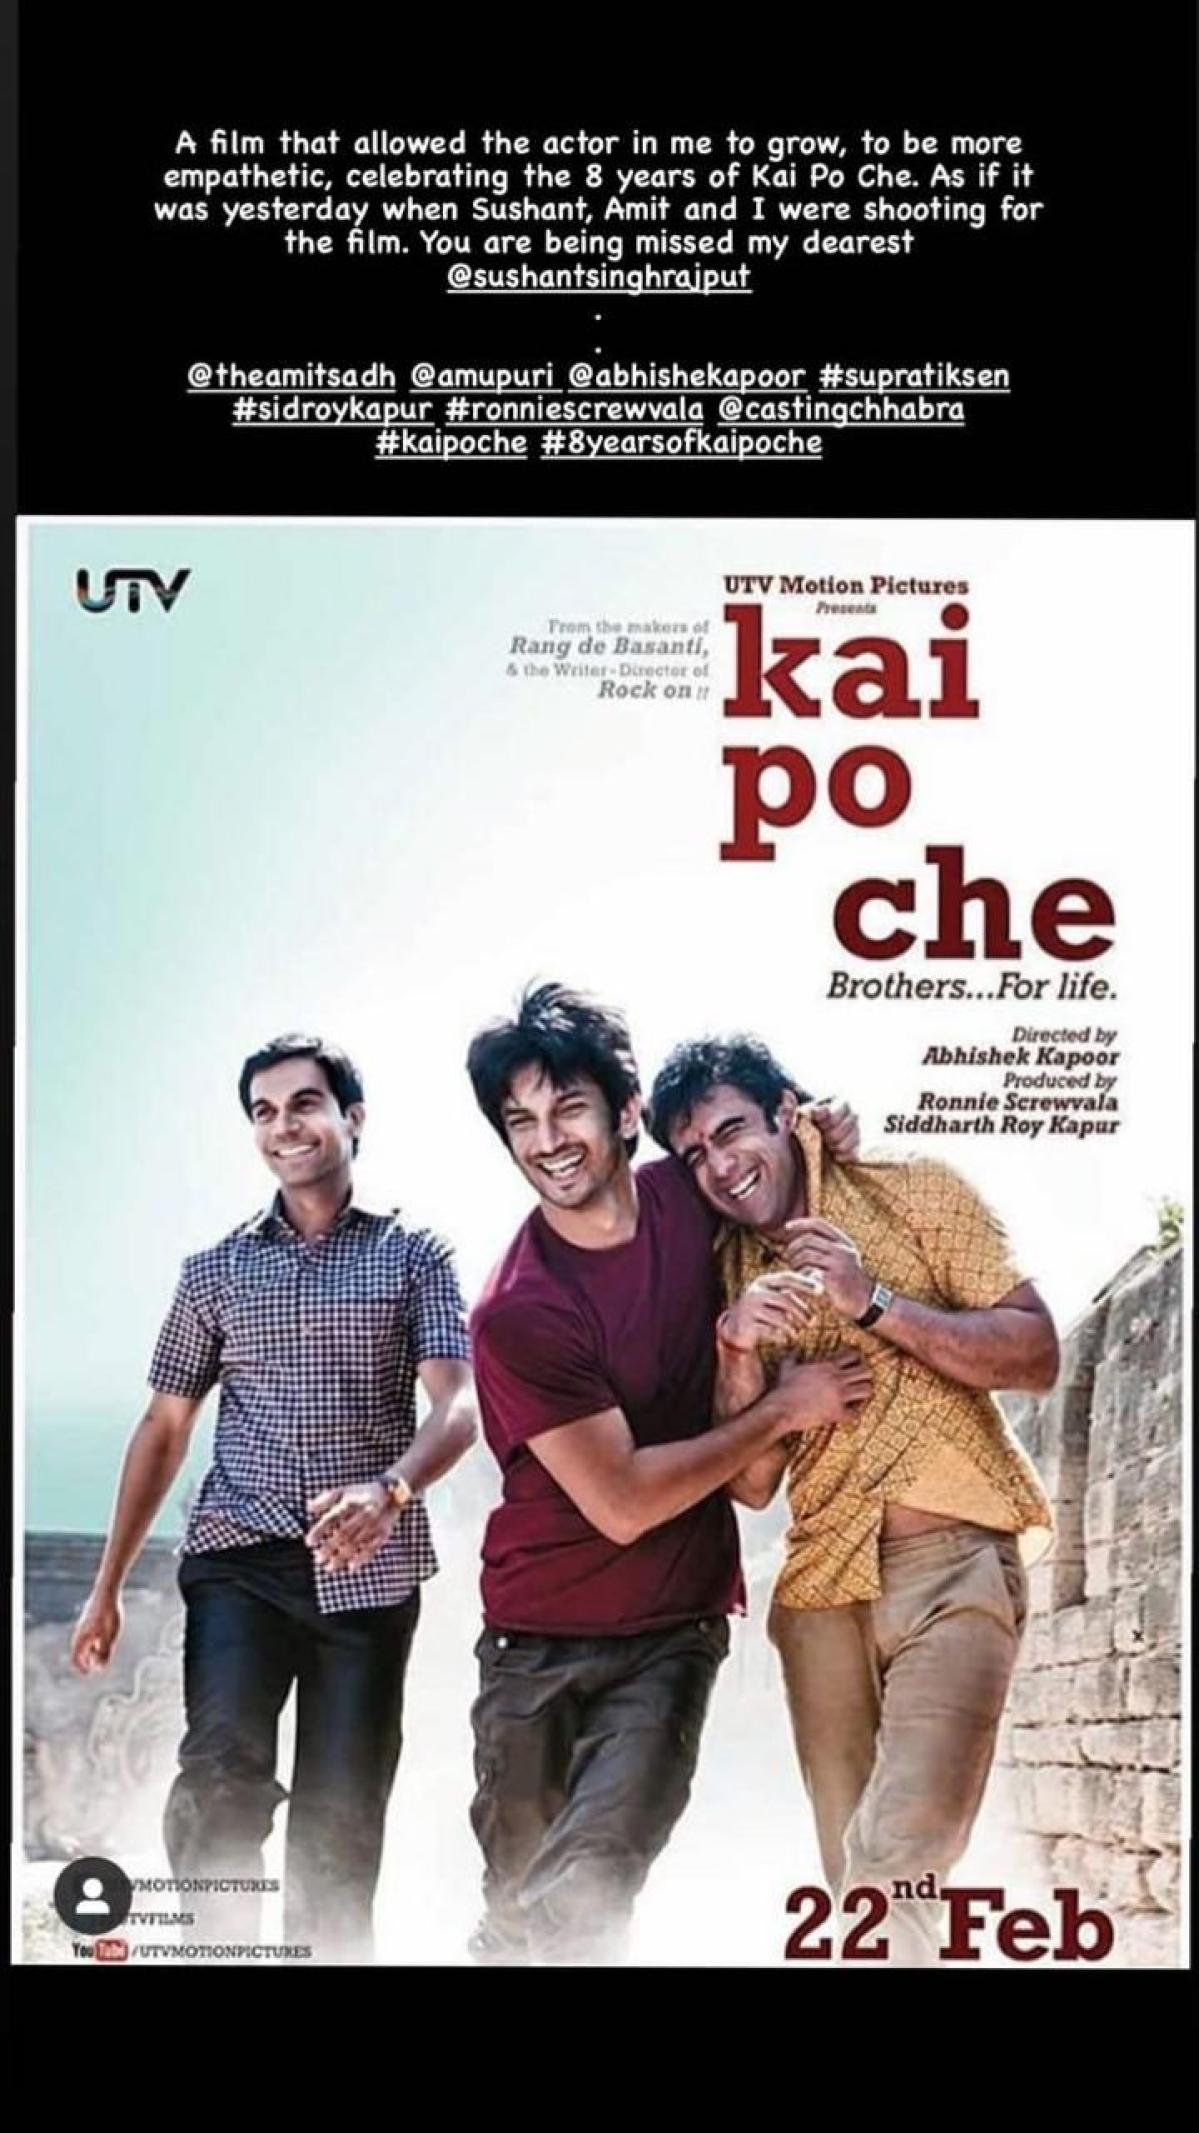 Rajkummar Rao pens emotional note remembering Sushant Singh Rajput as 'Kai Po Che' turns 8